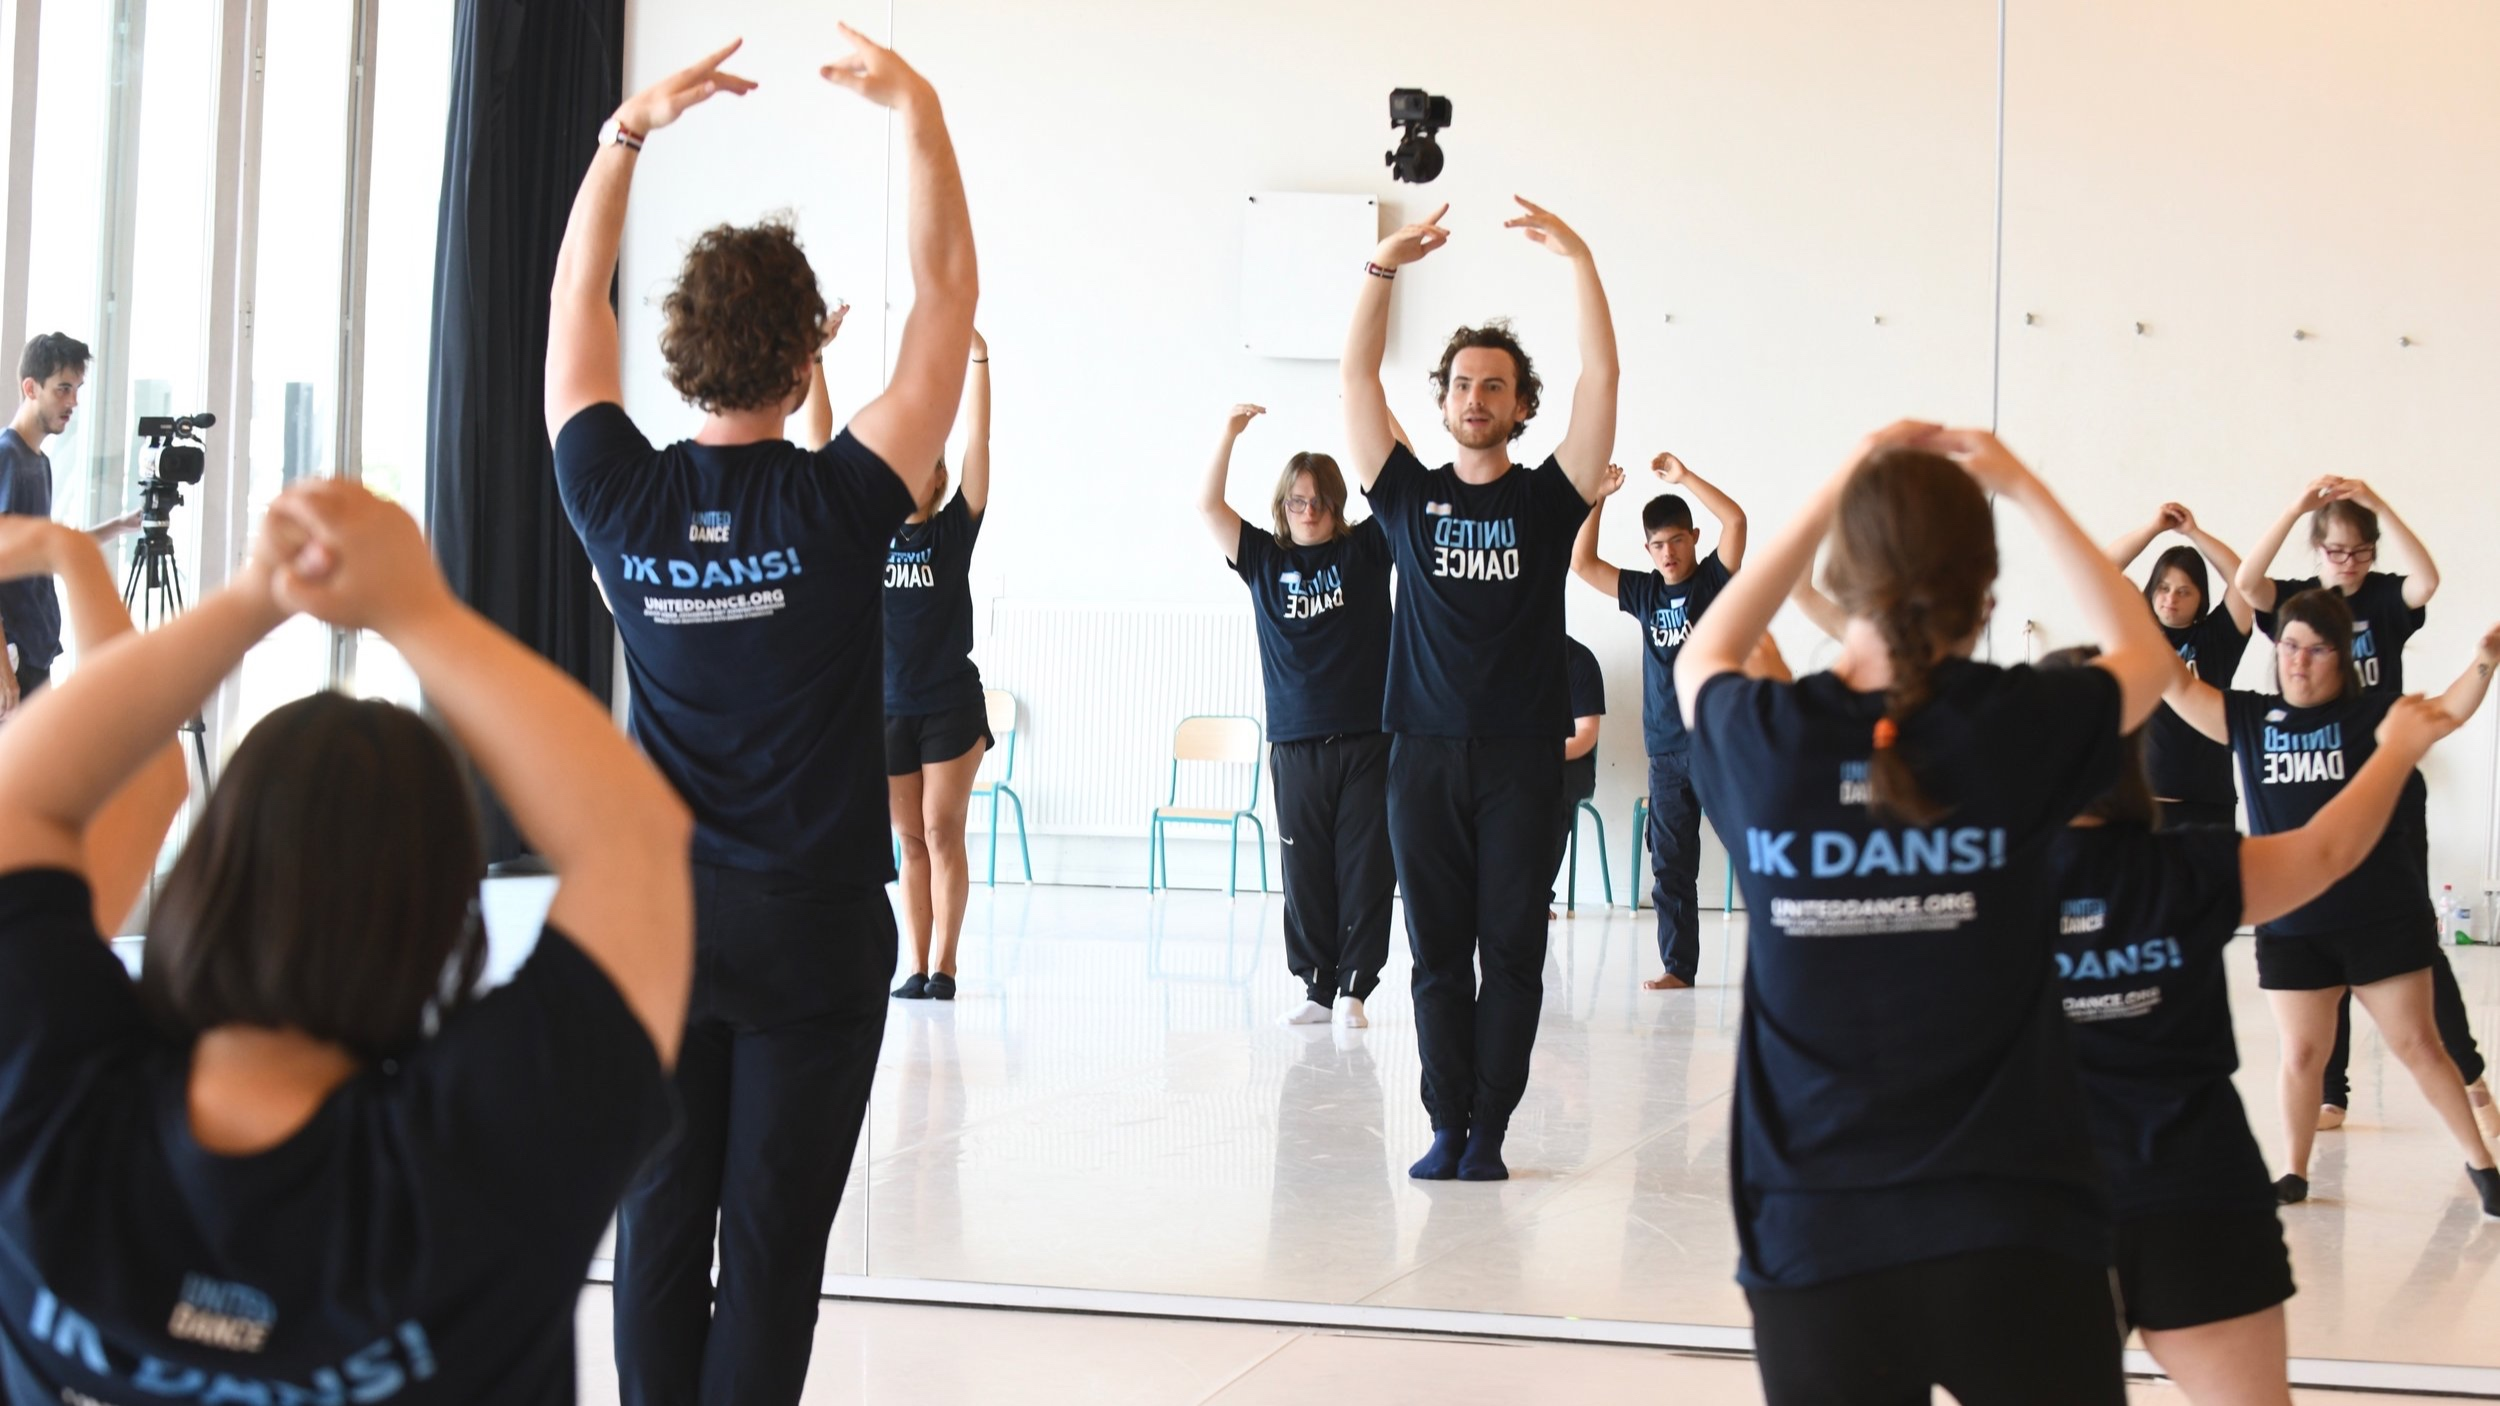 Paris, France - Paris Opera Ballet School, 26 - 31 August 2019Information - Registration